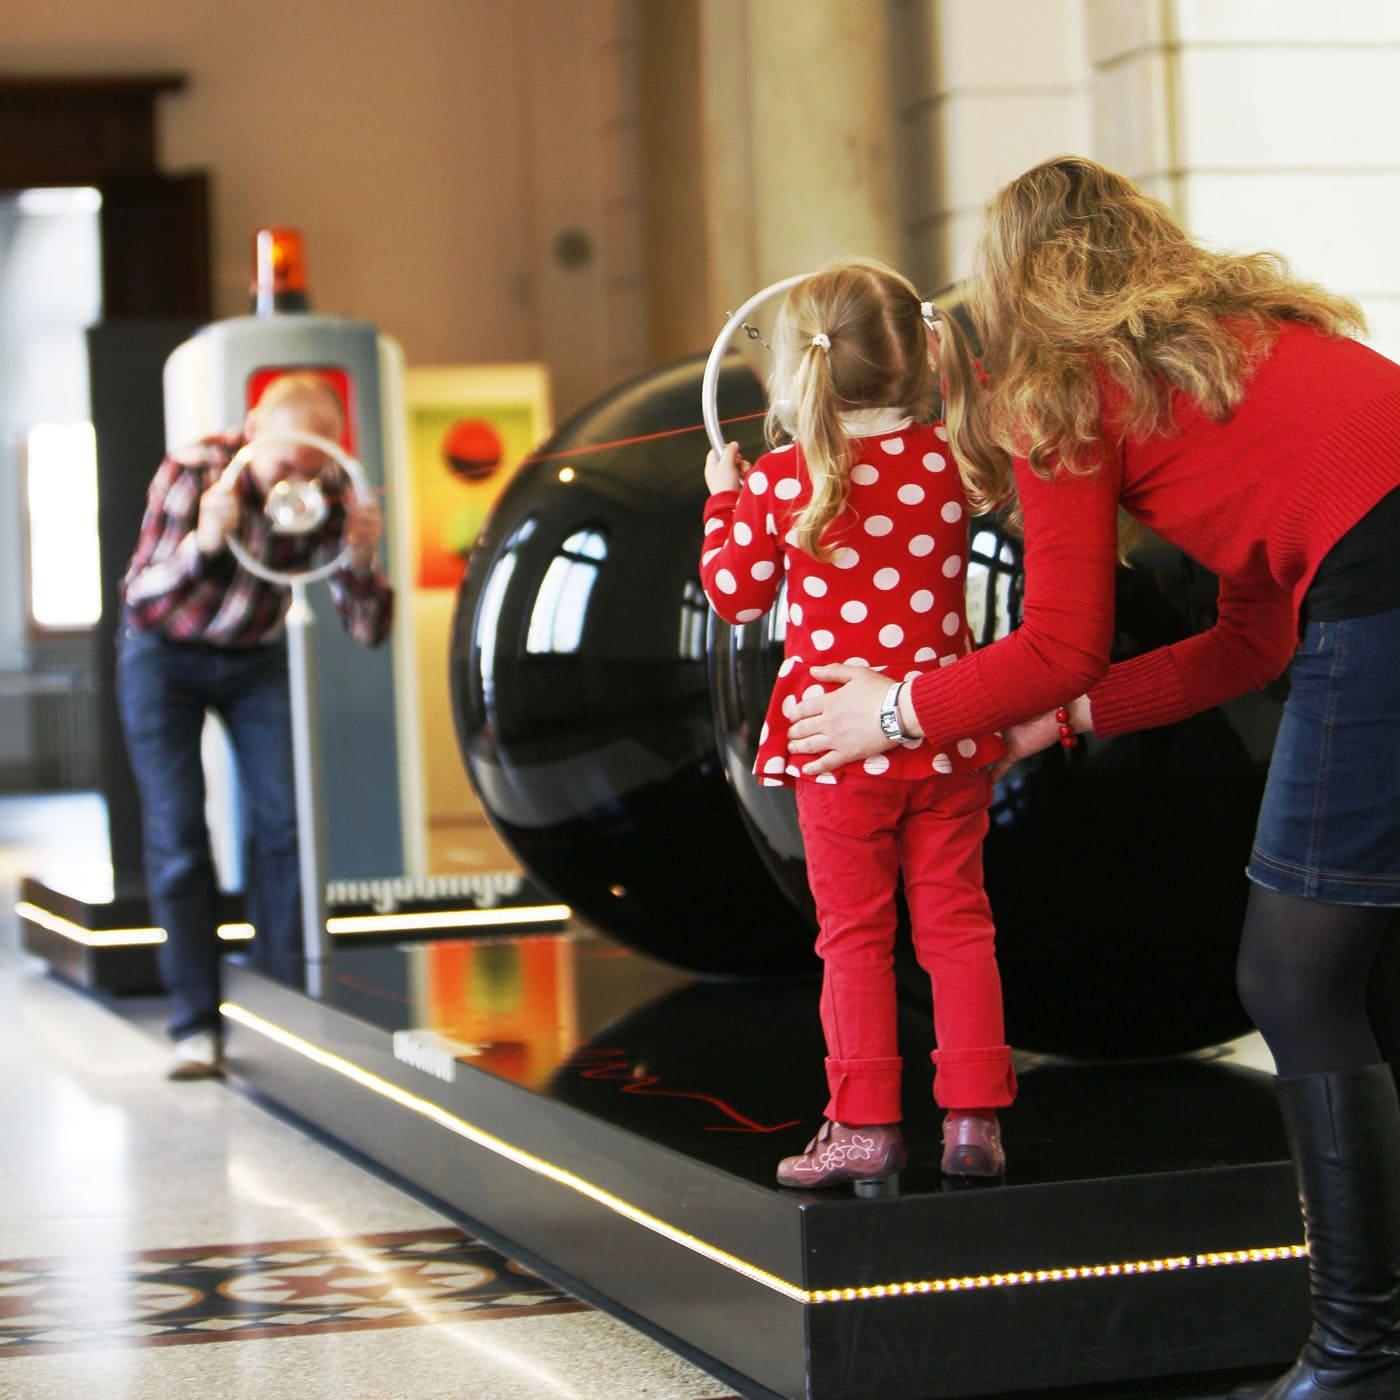 Kommunikationsgalerie im Museum für Kommunikation Berlin – Top Museen für Kinder in Berlin // HIMBEER